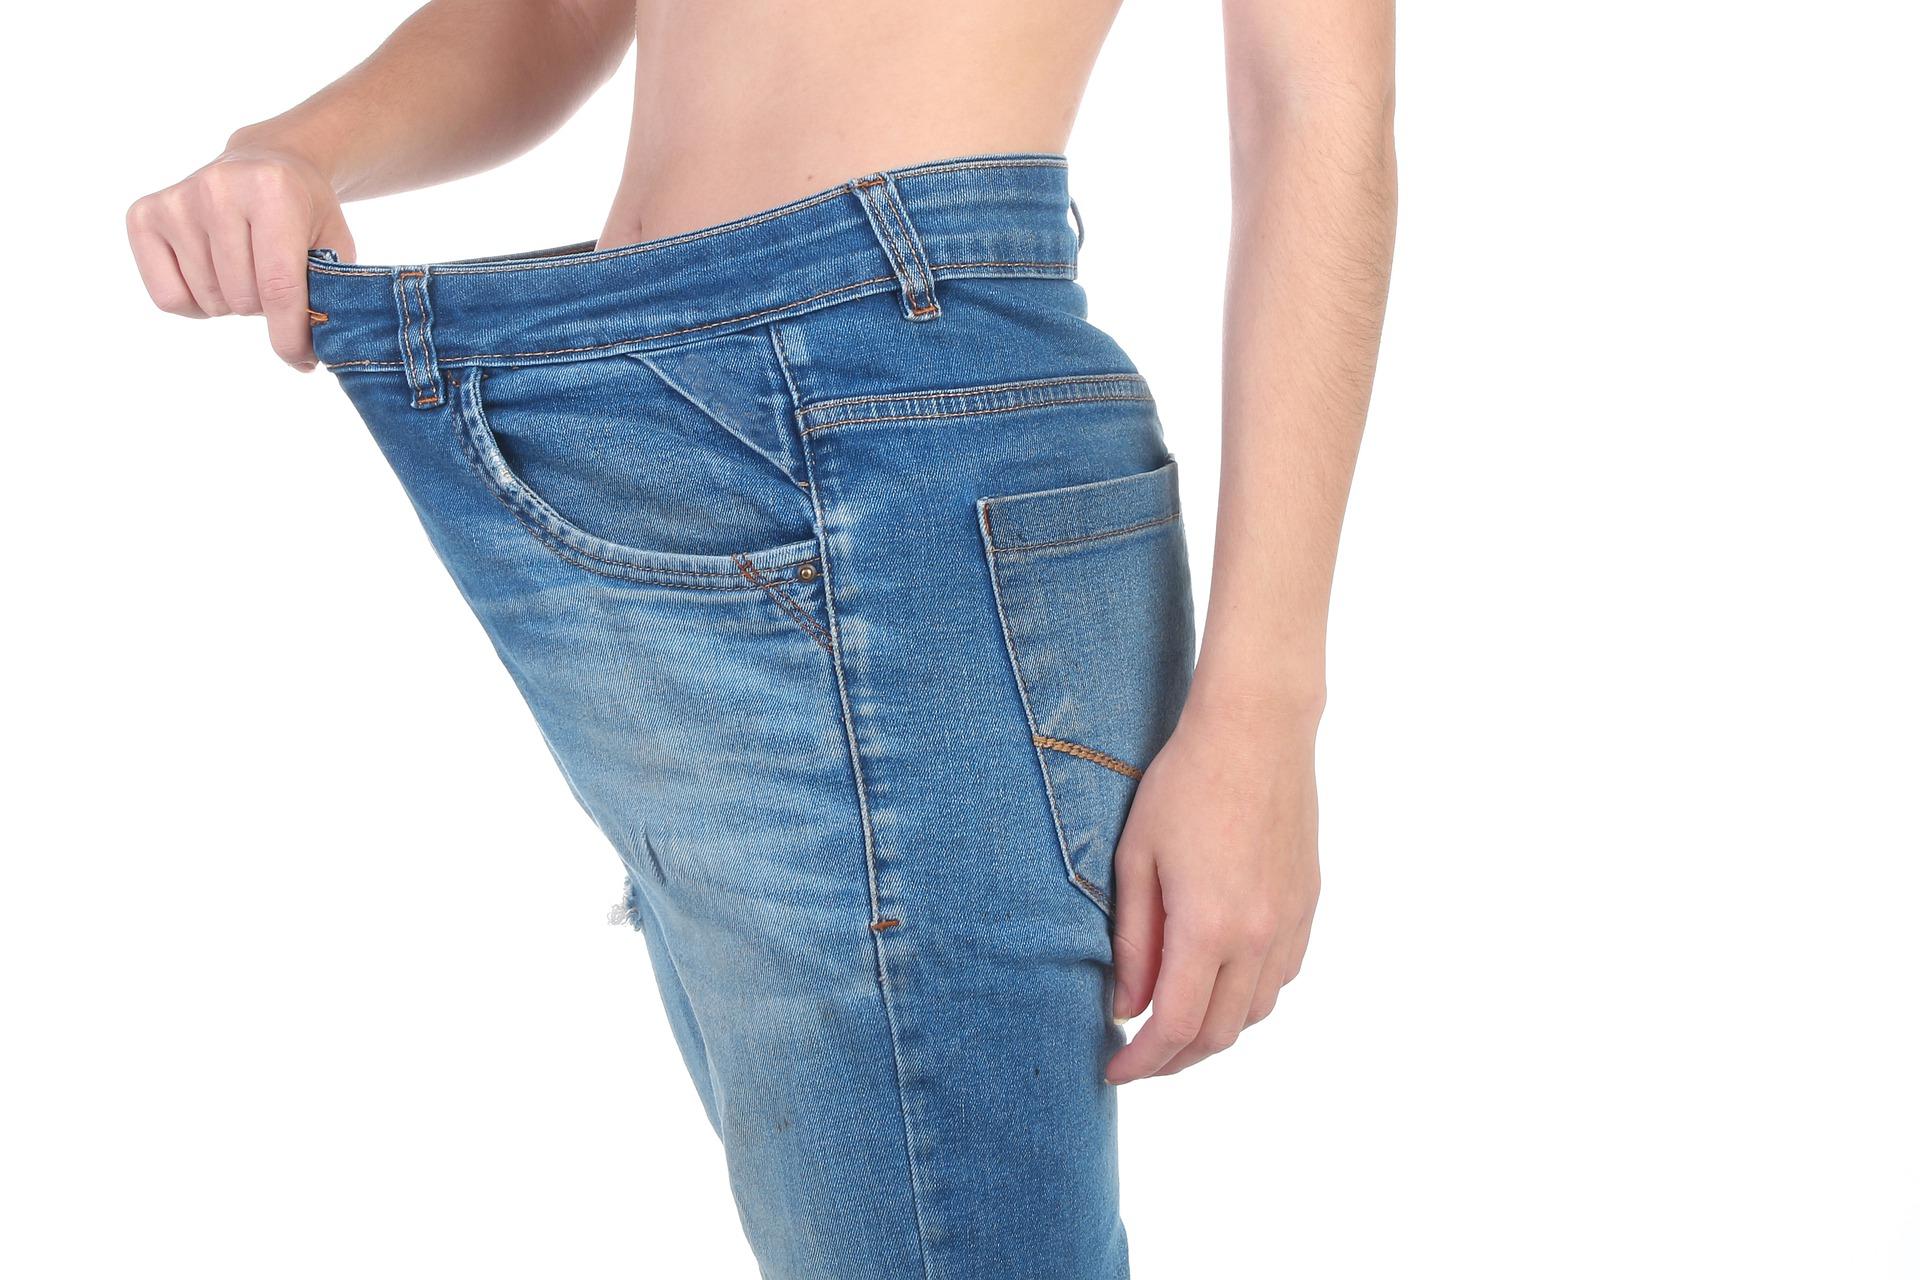 weight-loss-5985835_1920